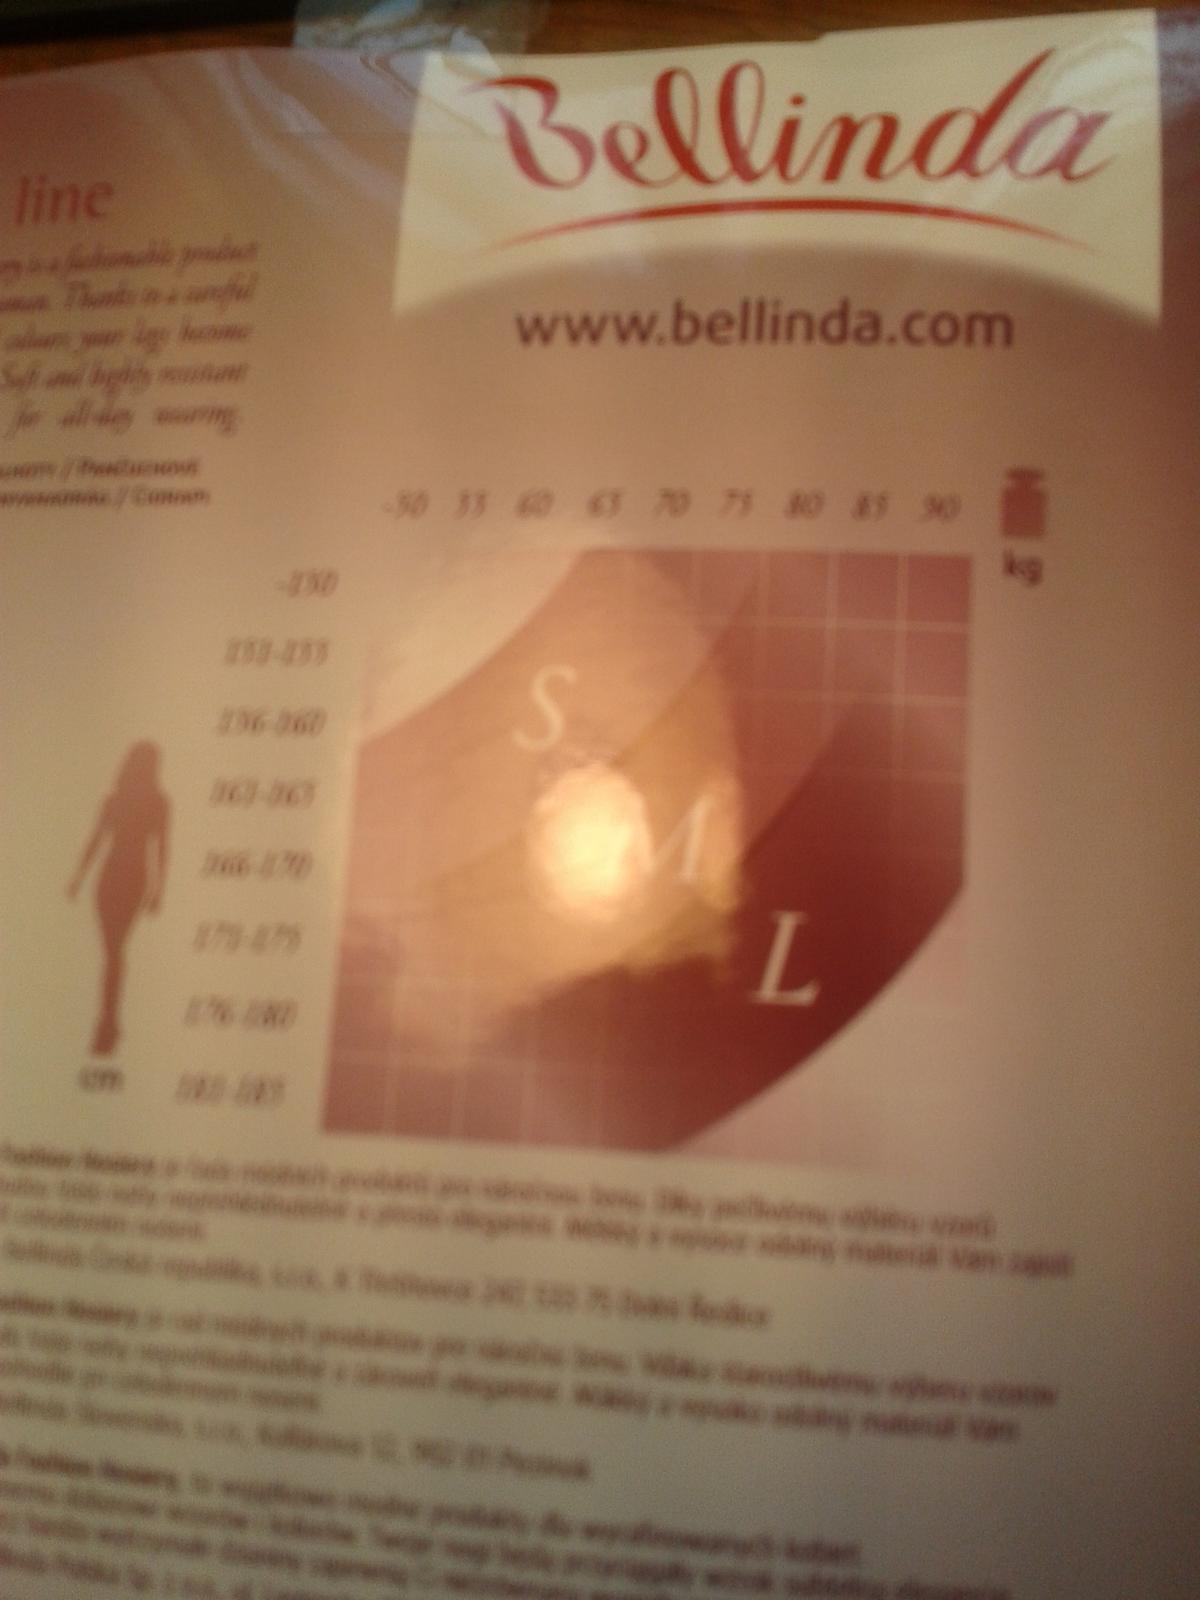 bellinda pancusky S a M - Obrázok č. 2